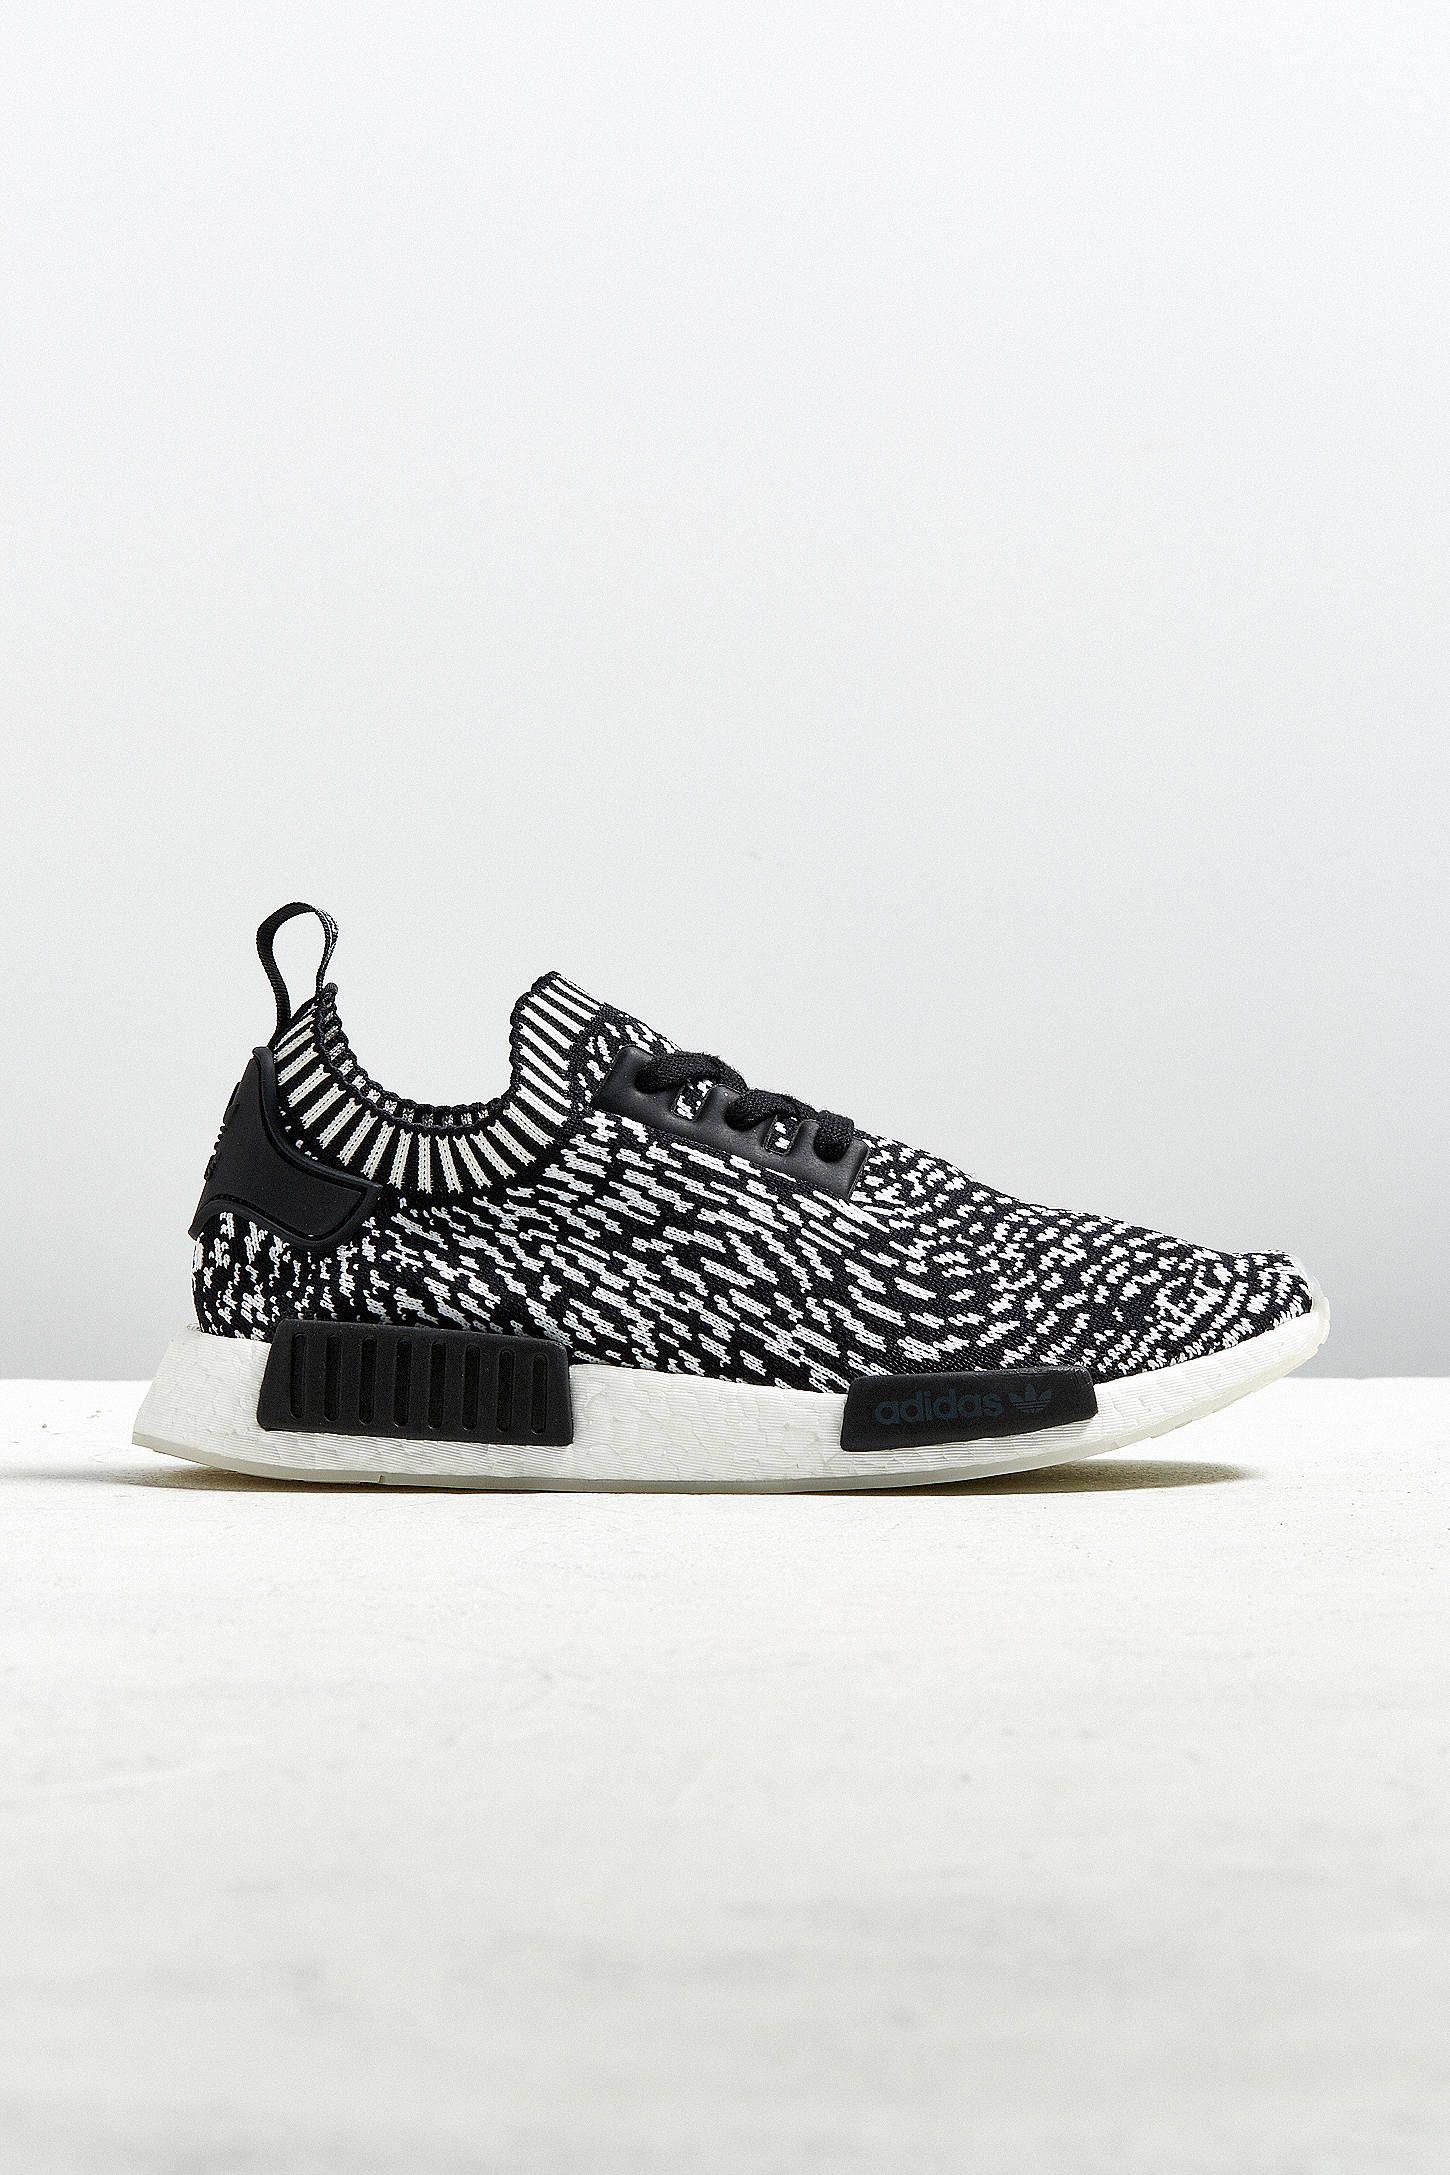 0f40634c7f Jason Markk Quick Wipes | Men's Shoes | Adidas nmd r1, Adidas nmd ...